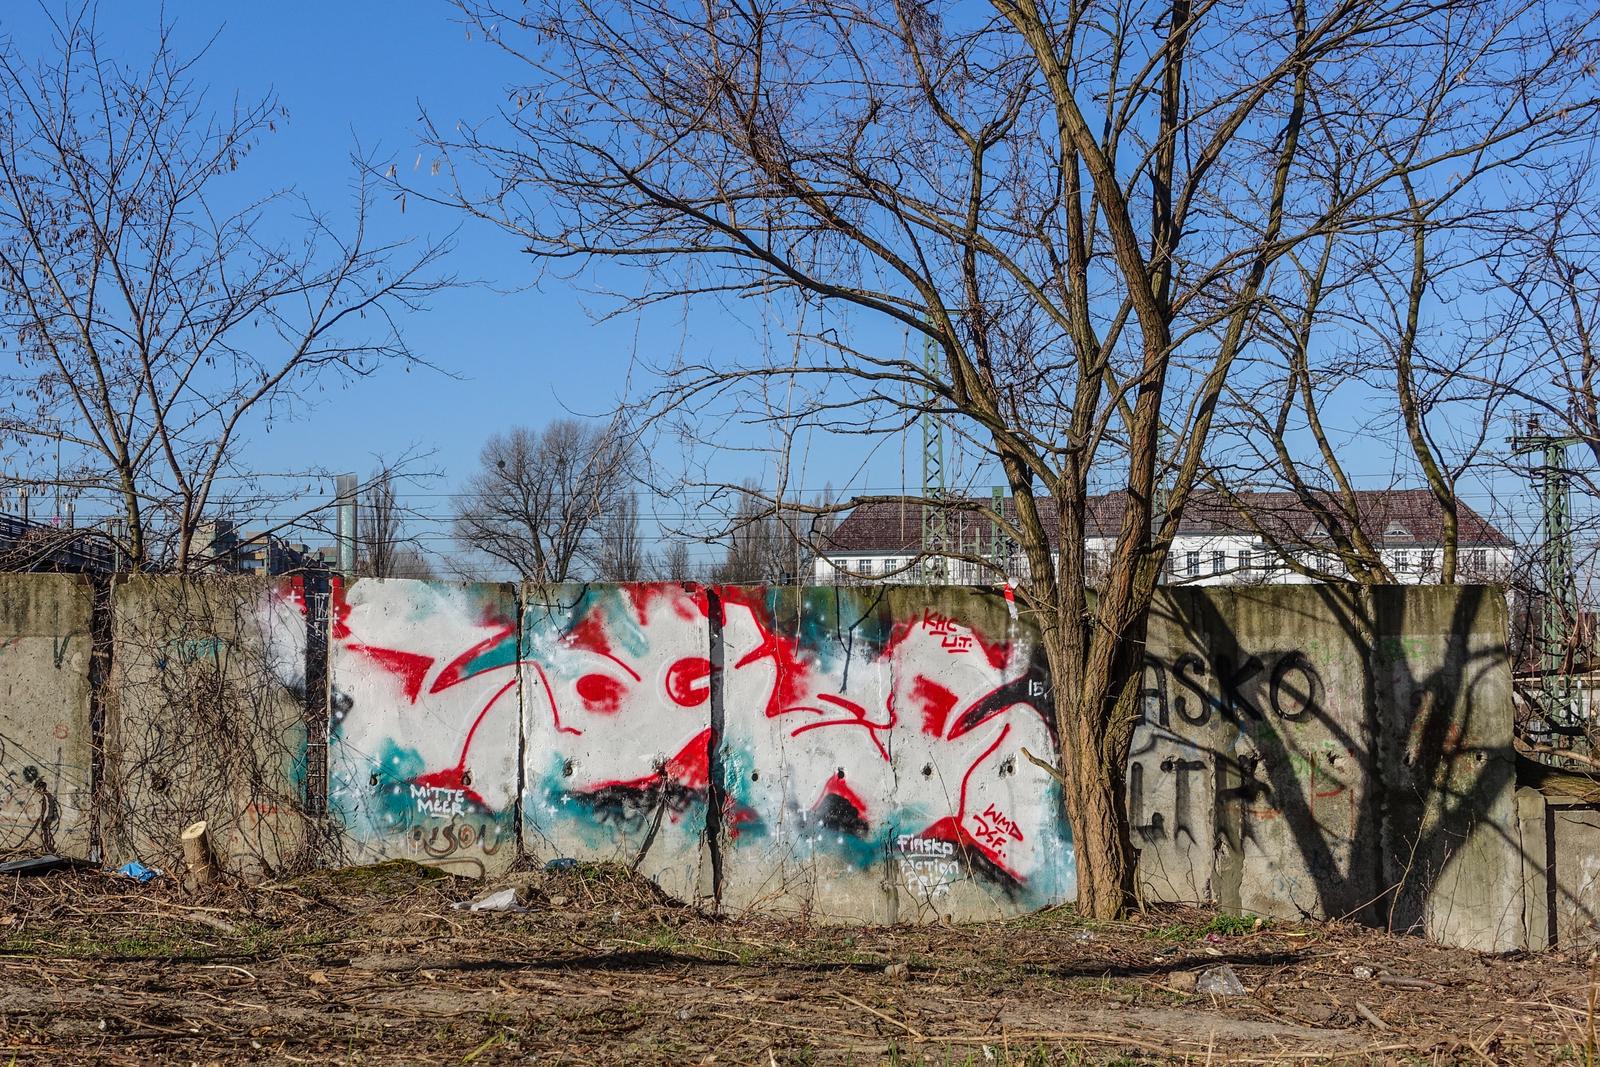 berlin streetart fundst cke 014 feb m r 2015 urbanpresents. Black Bedroom Furniture Sets. Home Design Ideas